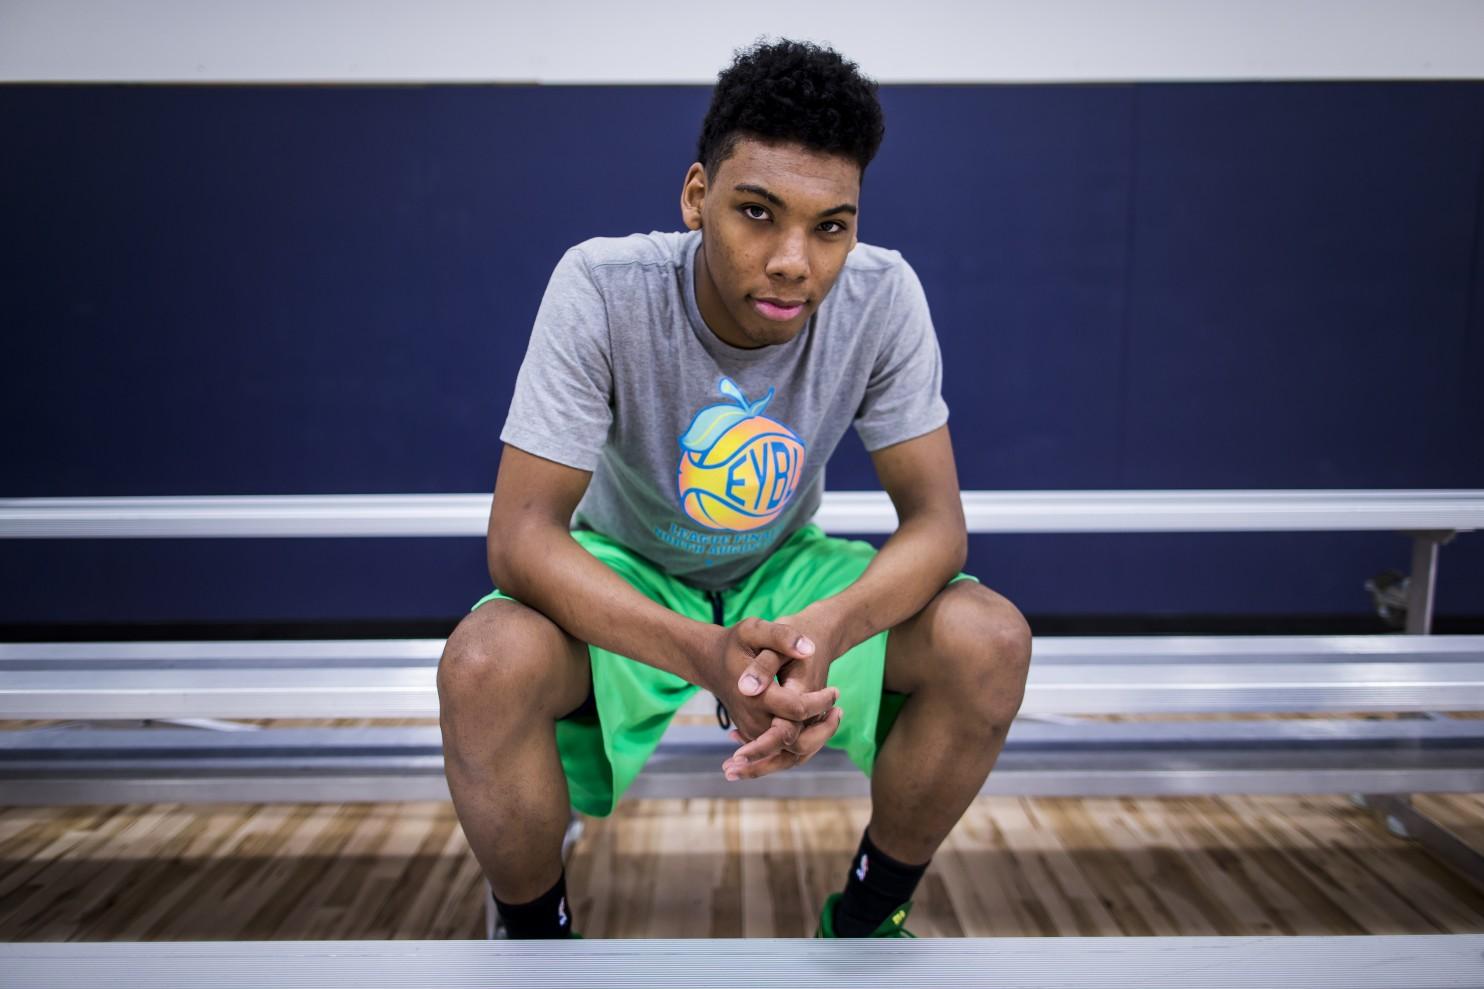 Basketball Coaching: Confident or Arrogant?